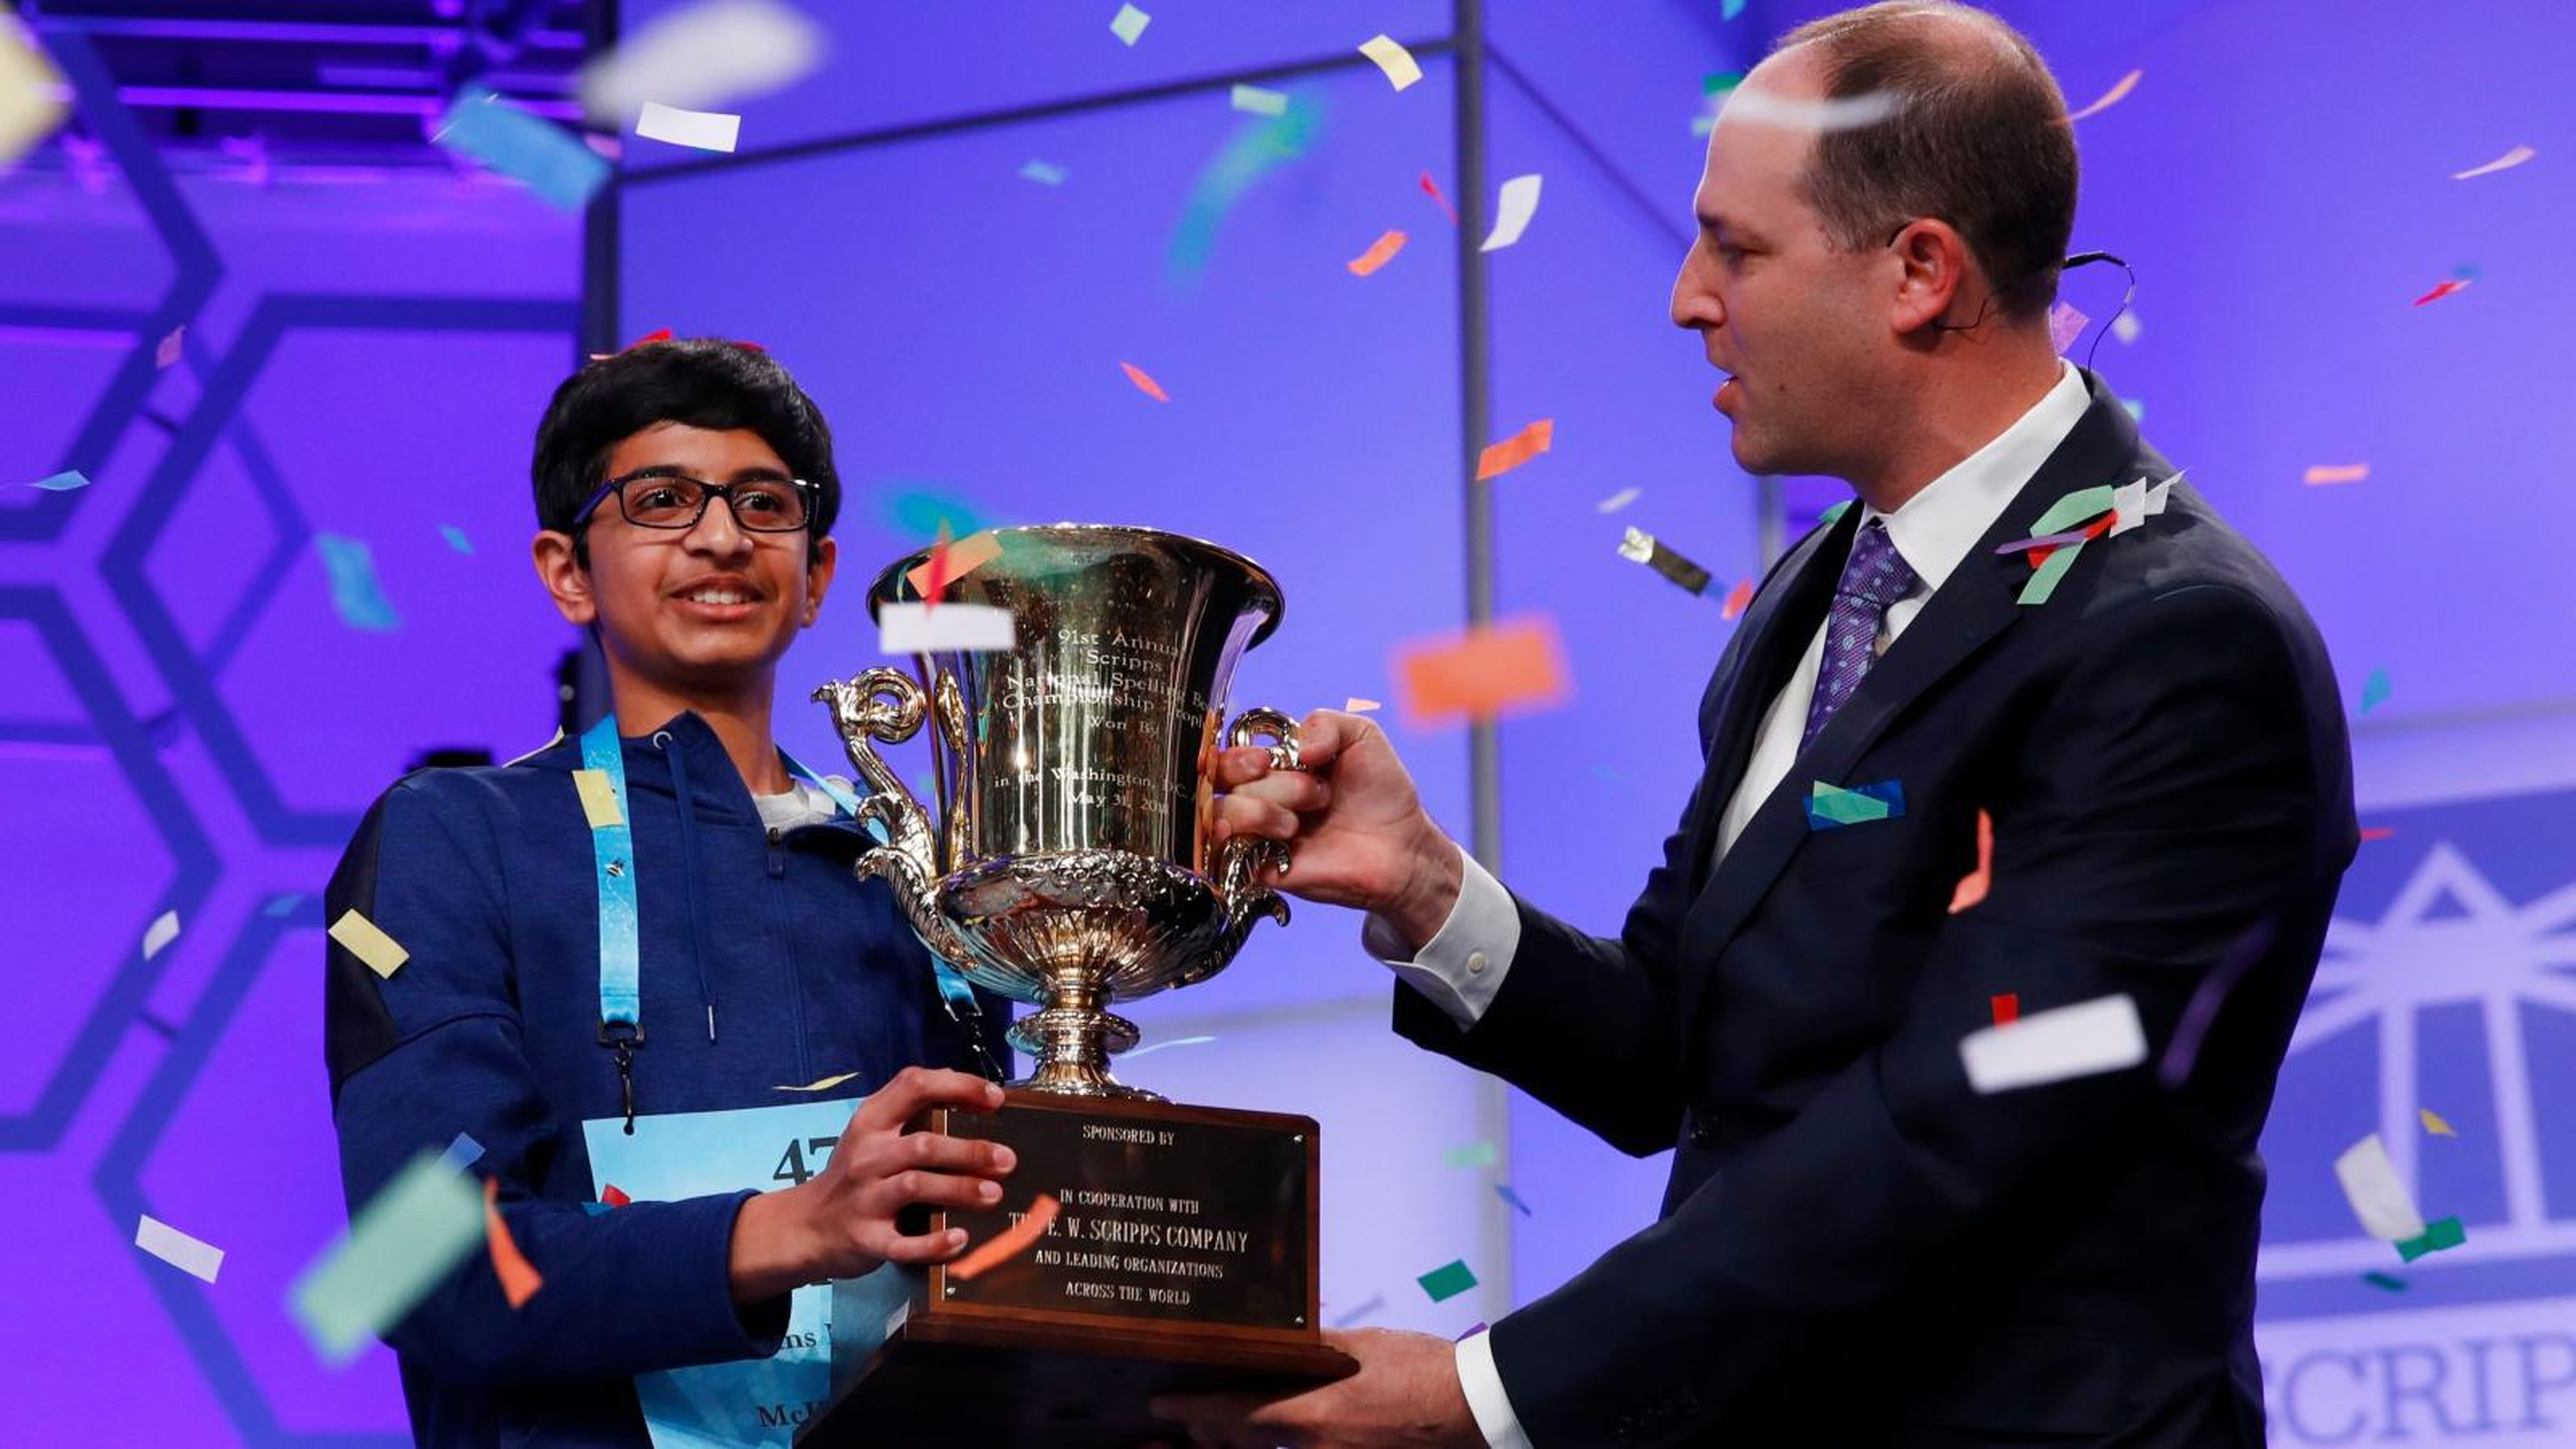 The 2018 Spelling Bee Champion Winning Word Koinonia And Winners Andrew Smith Classic Formal Shirt Cokelat S From Past 20 Years Quartz